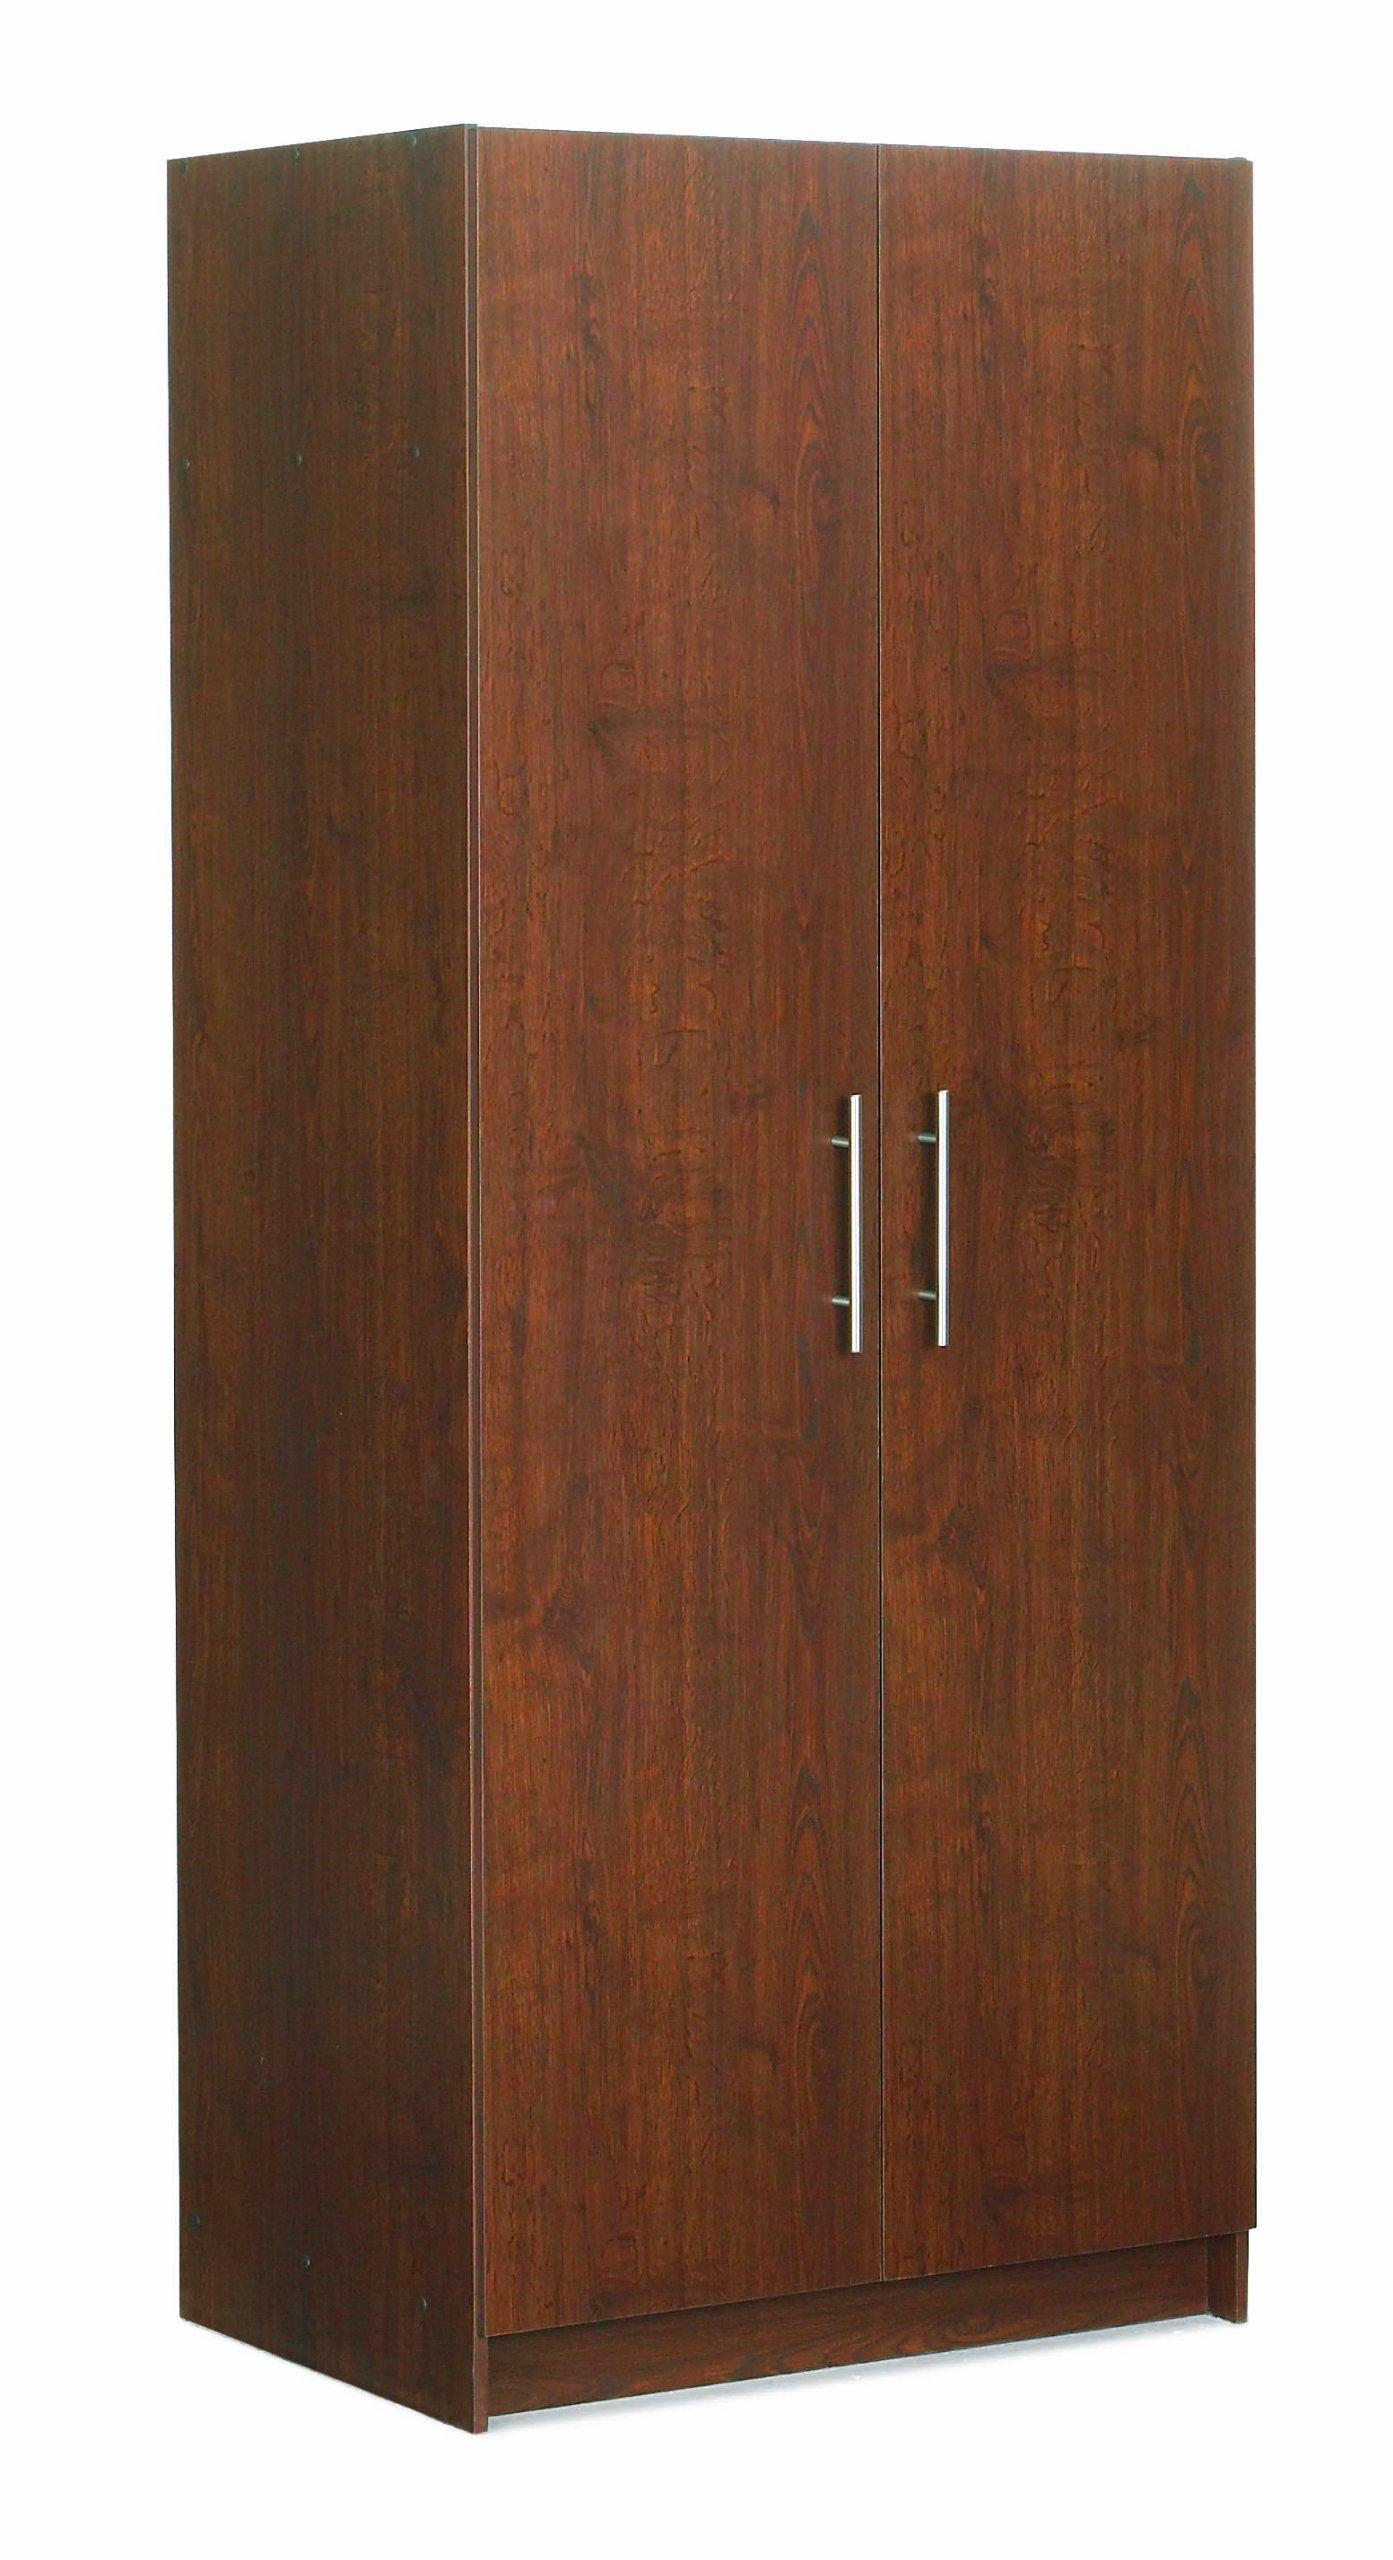 akadaHOME ST106179J 2 Door Wardrobe